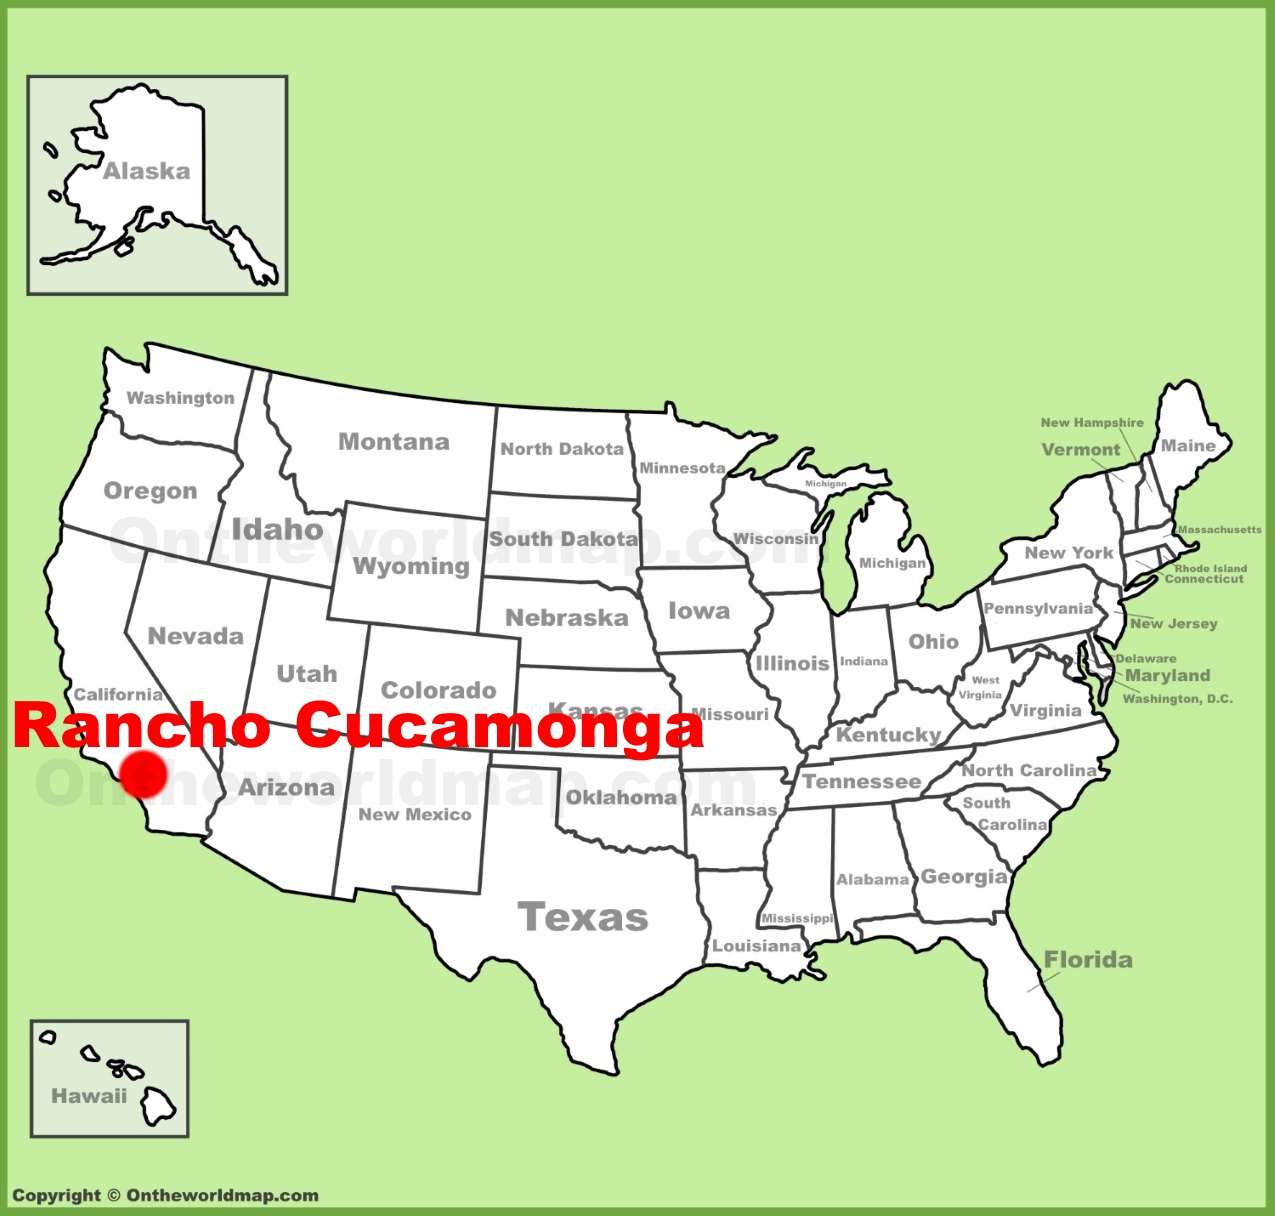 Rancho Cucamonga California Map - Klipy - Rancho Cucamonga California Map